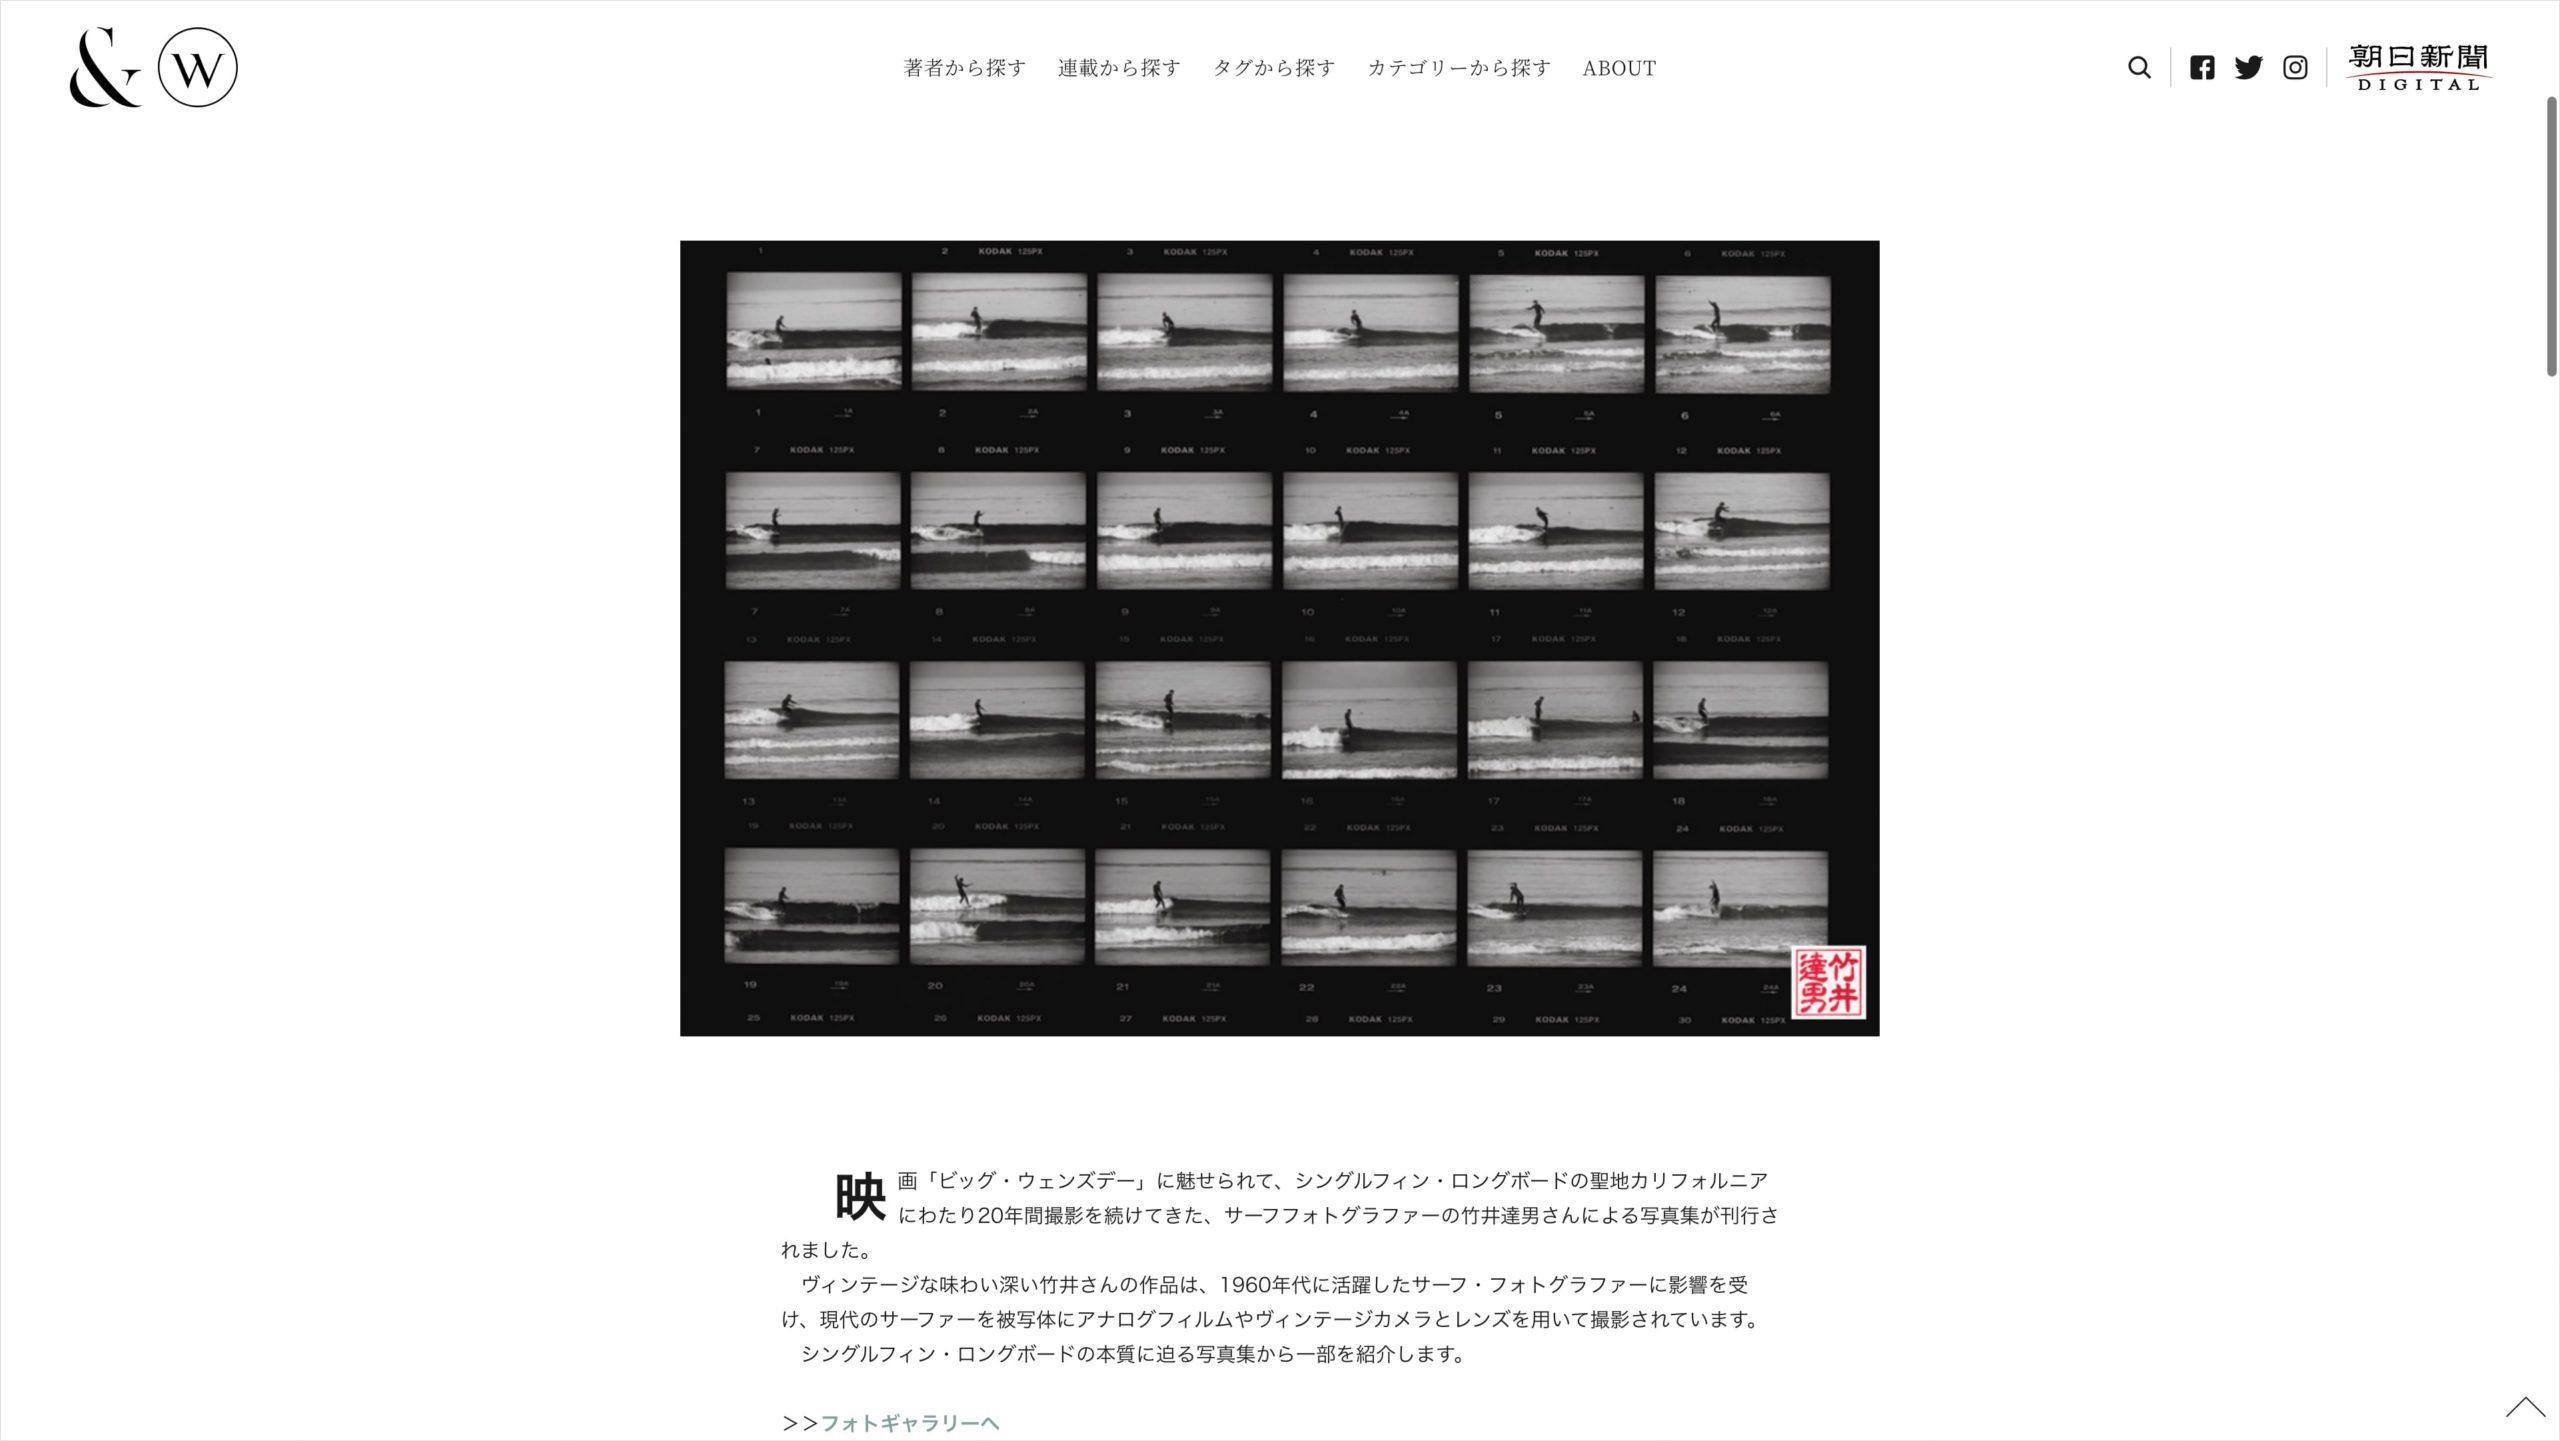 Tatsuo Takei Intervew by Asahi Digital